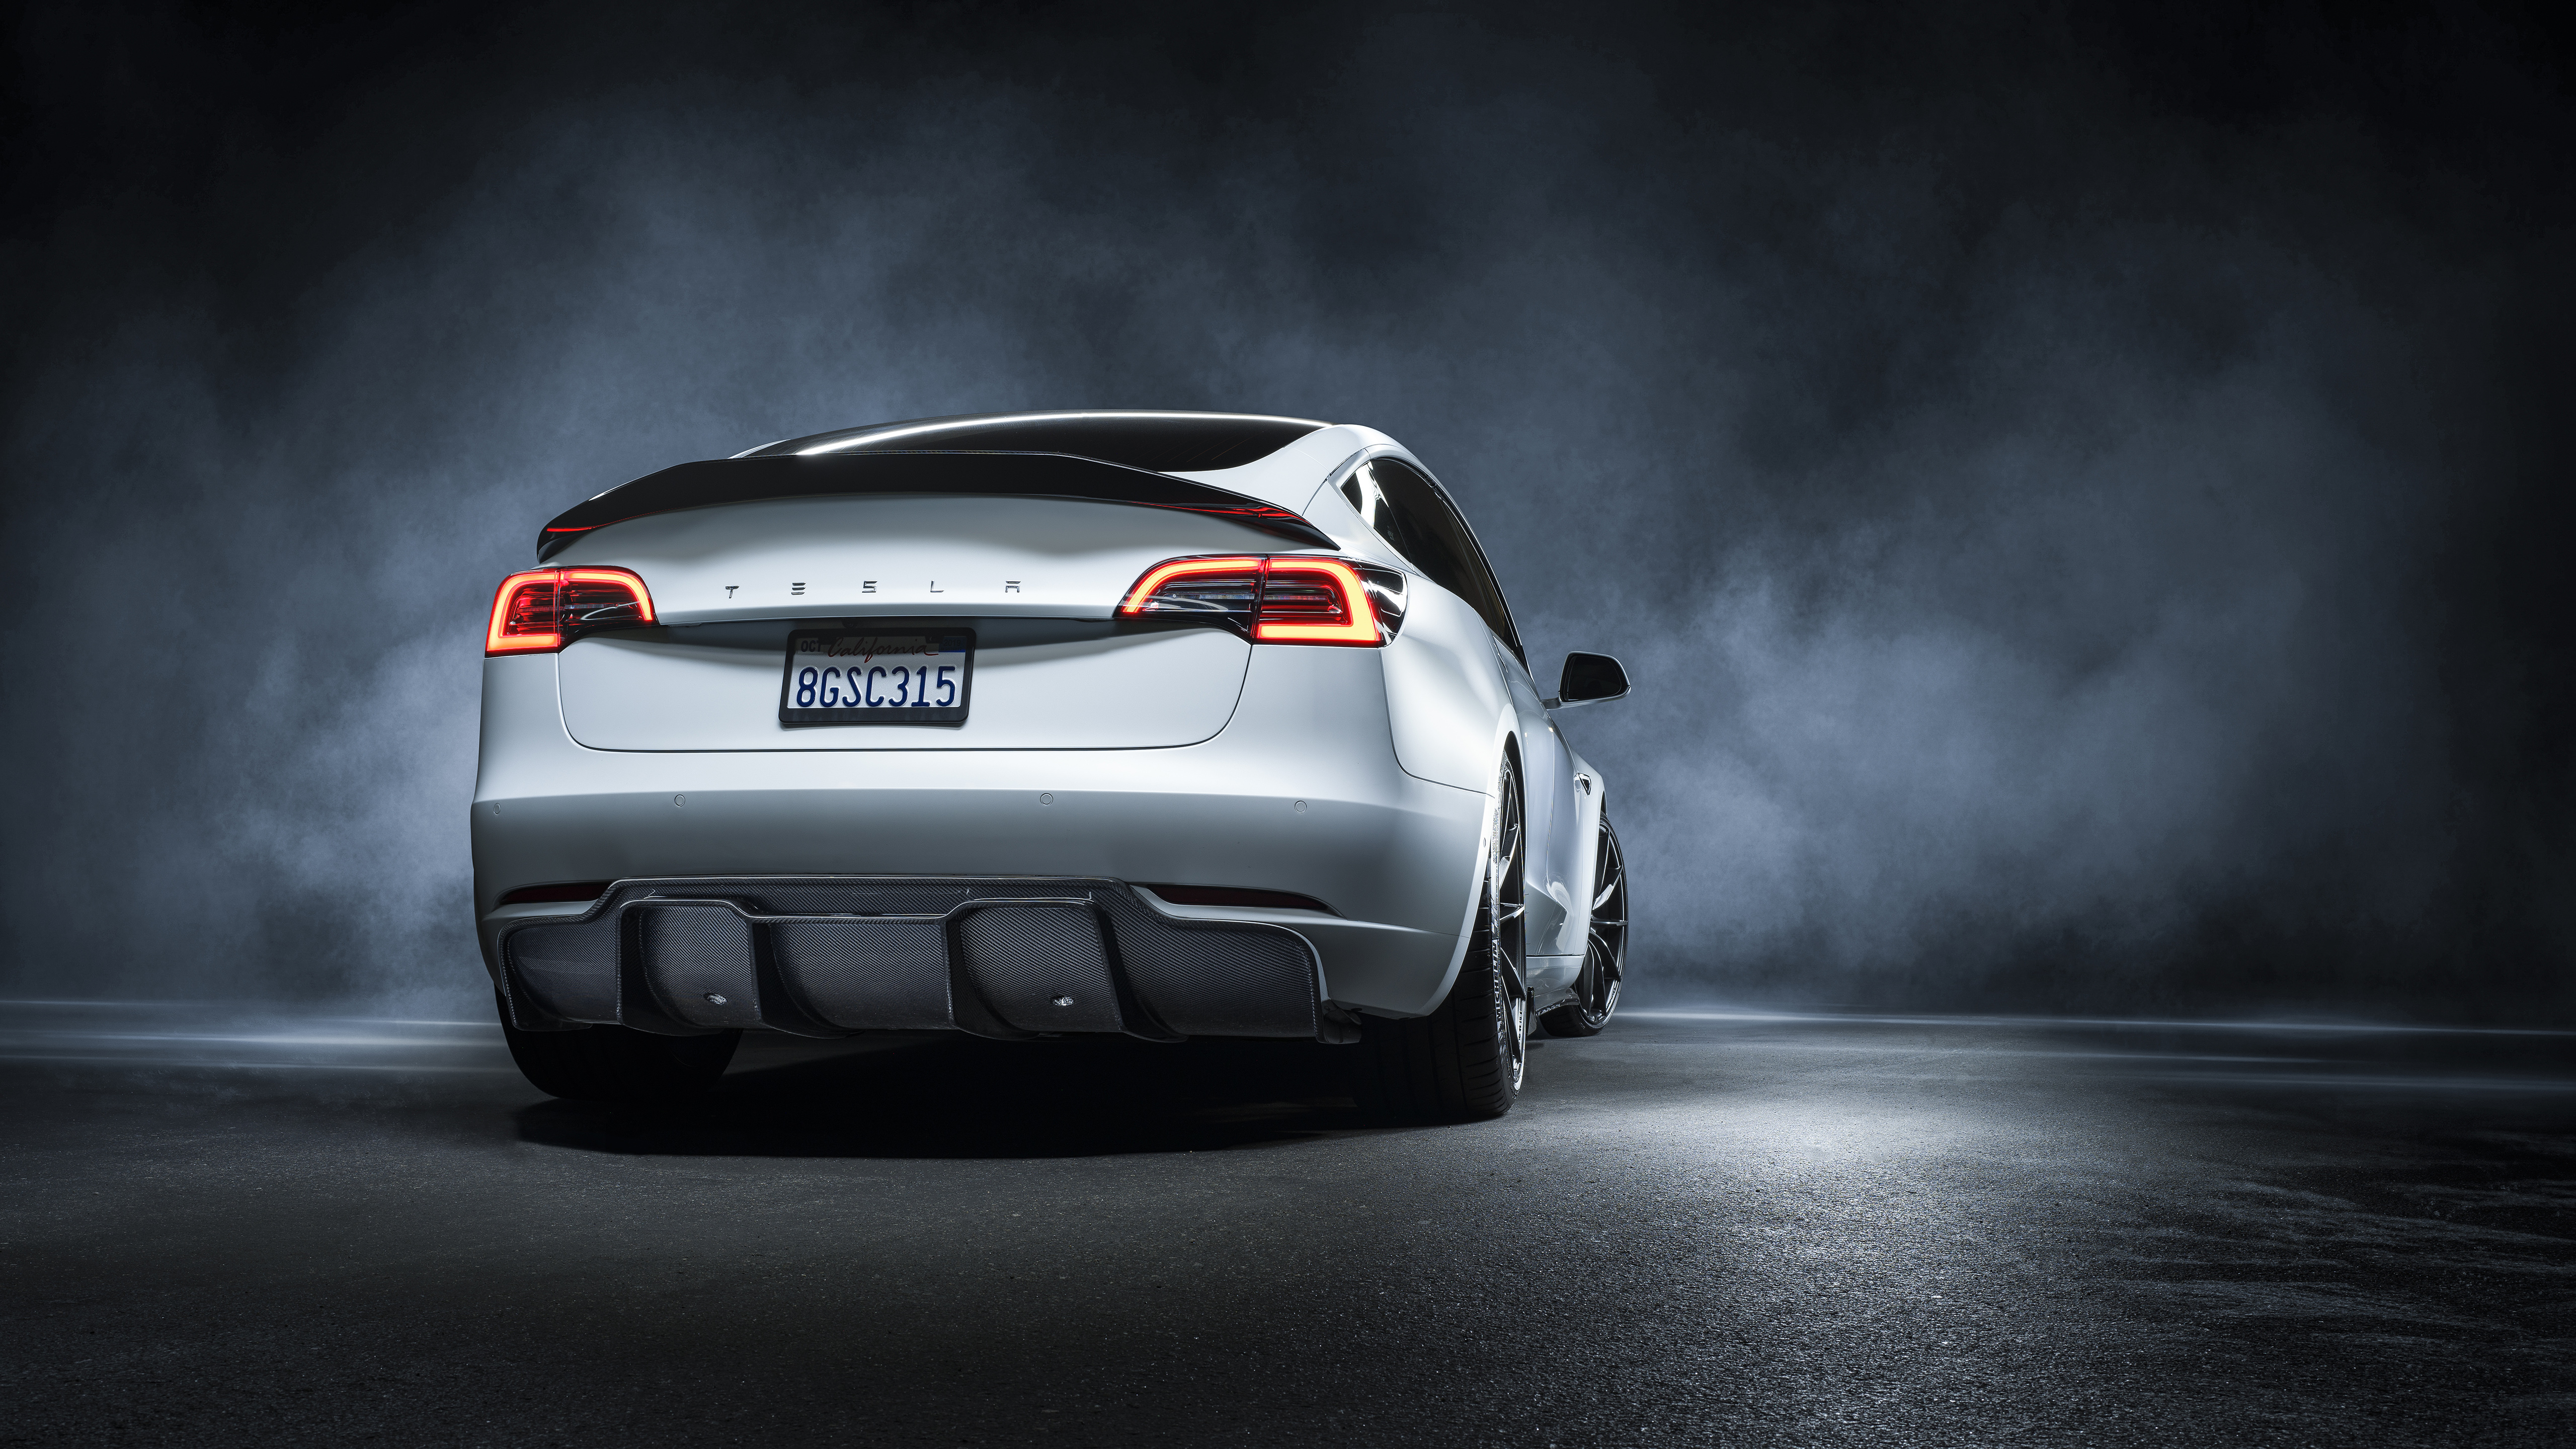 Vorsteiner Tesla Model 3 Volta 2019 4k 2 Wallpaper Hd Car